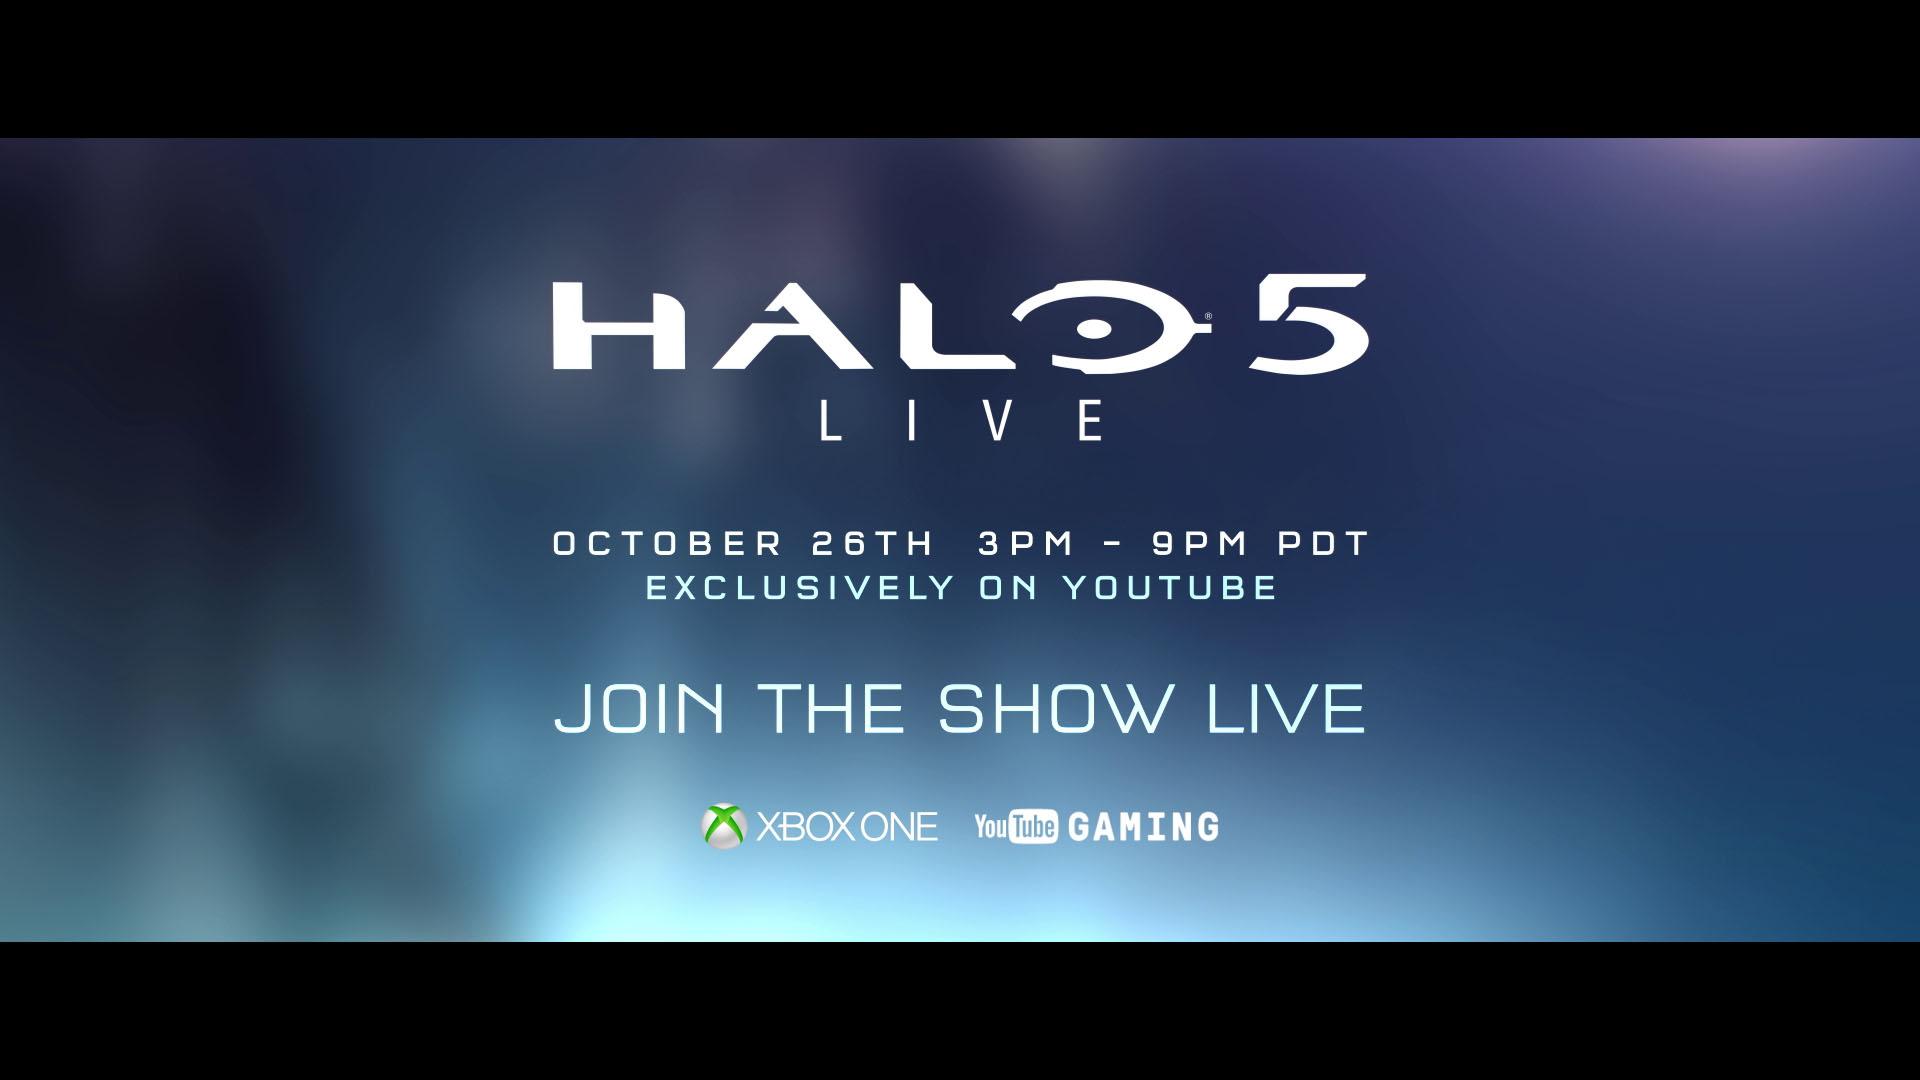 Halo 5: LIVE announce trailer